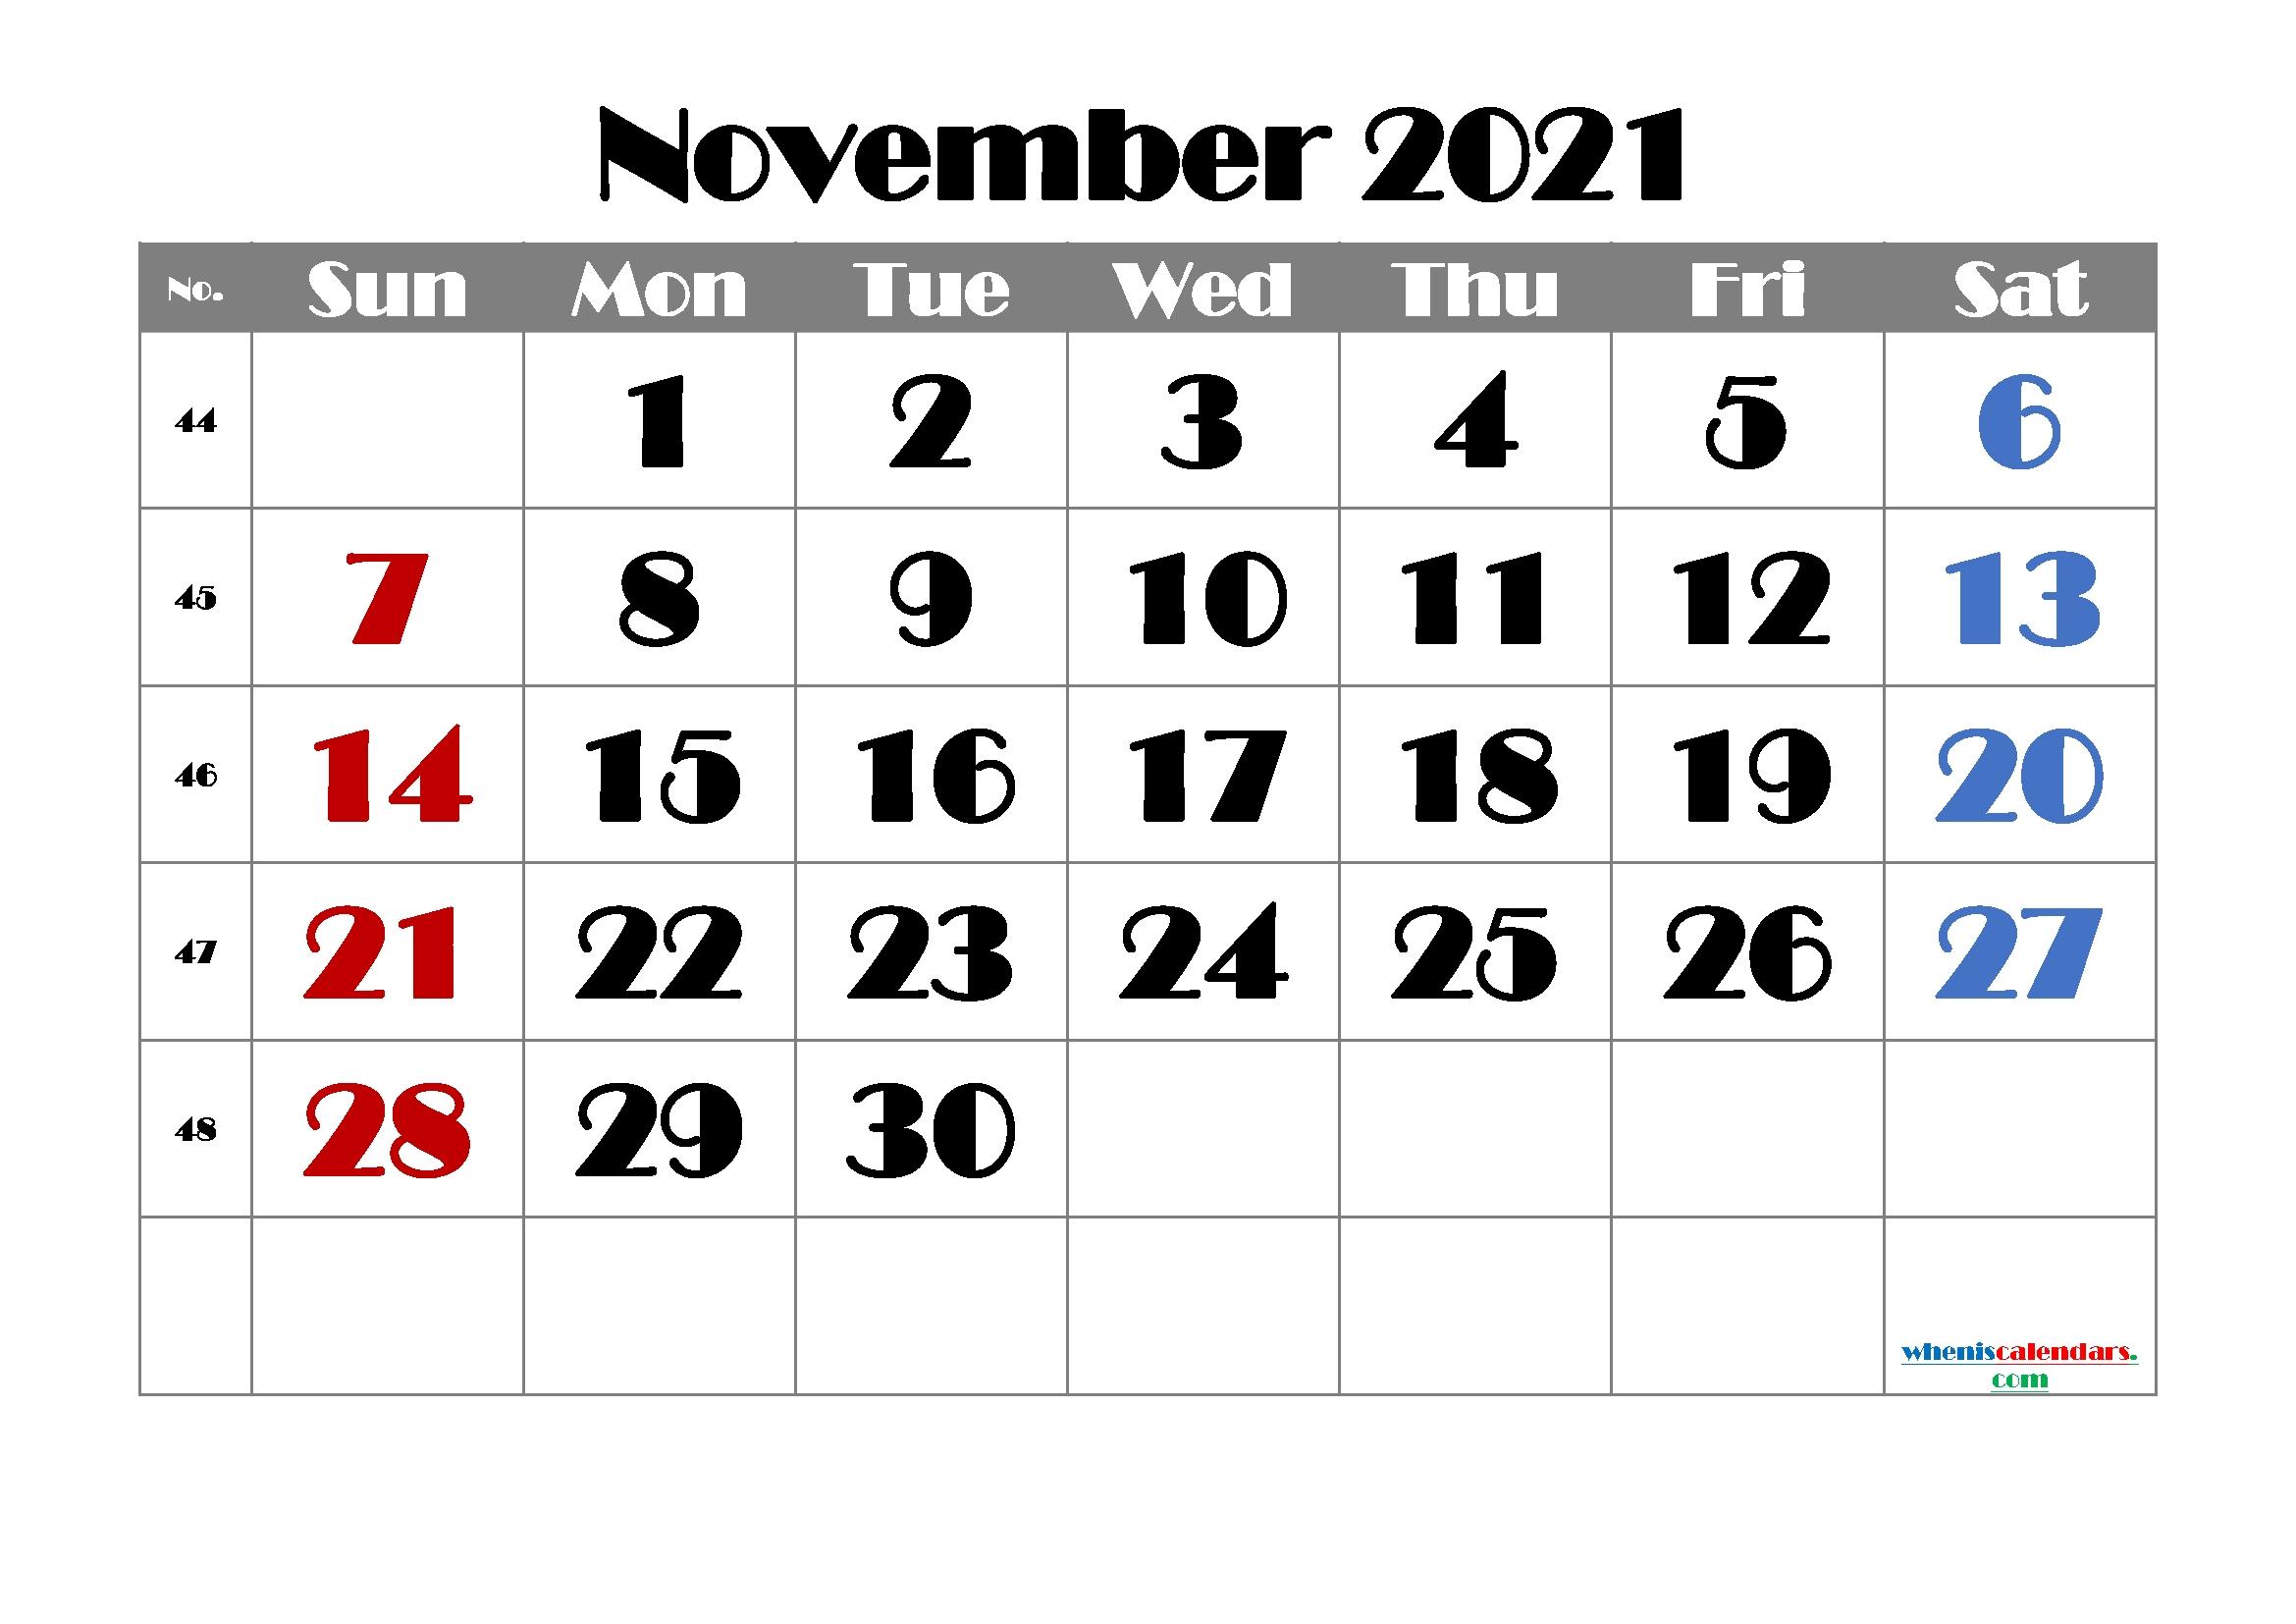 Free Printable November 2021 Calendar | Template M21Broadway1 - Free Printable 2020 Monthly Free Printable November 2021 Calendar With Holidays